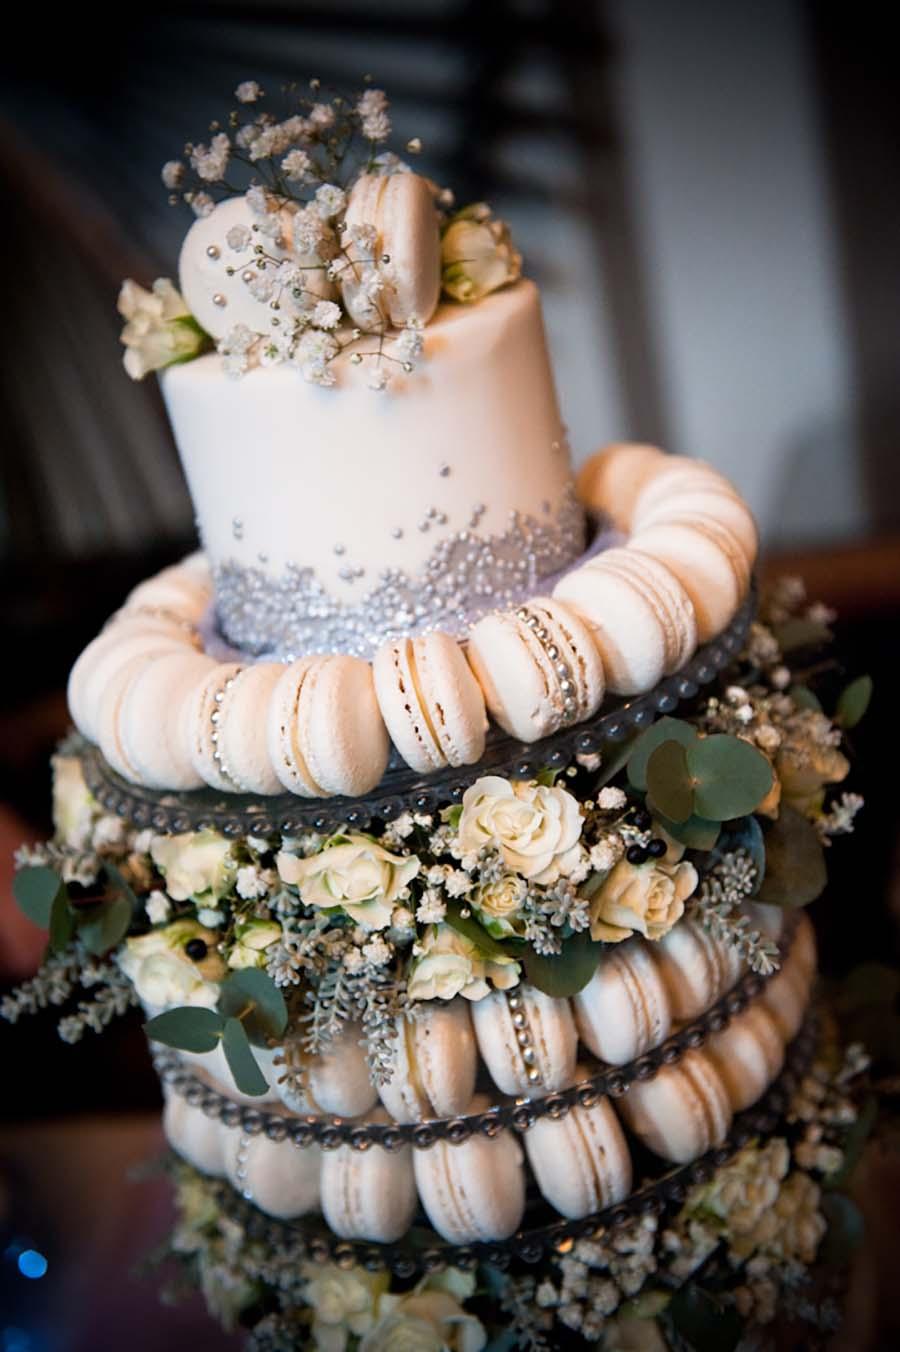 Buckinghams-at-belvoir-castle-wedding-fair-rachael-connerton-photography-65